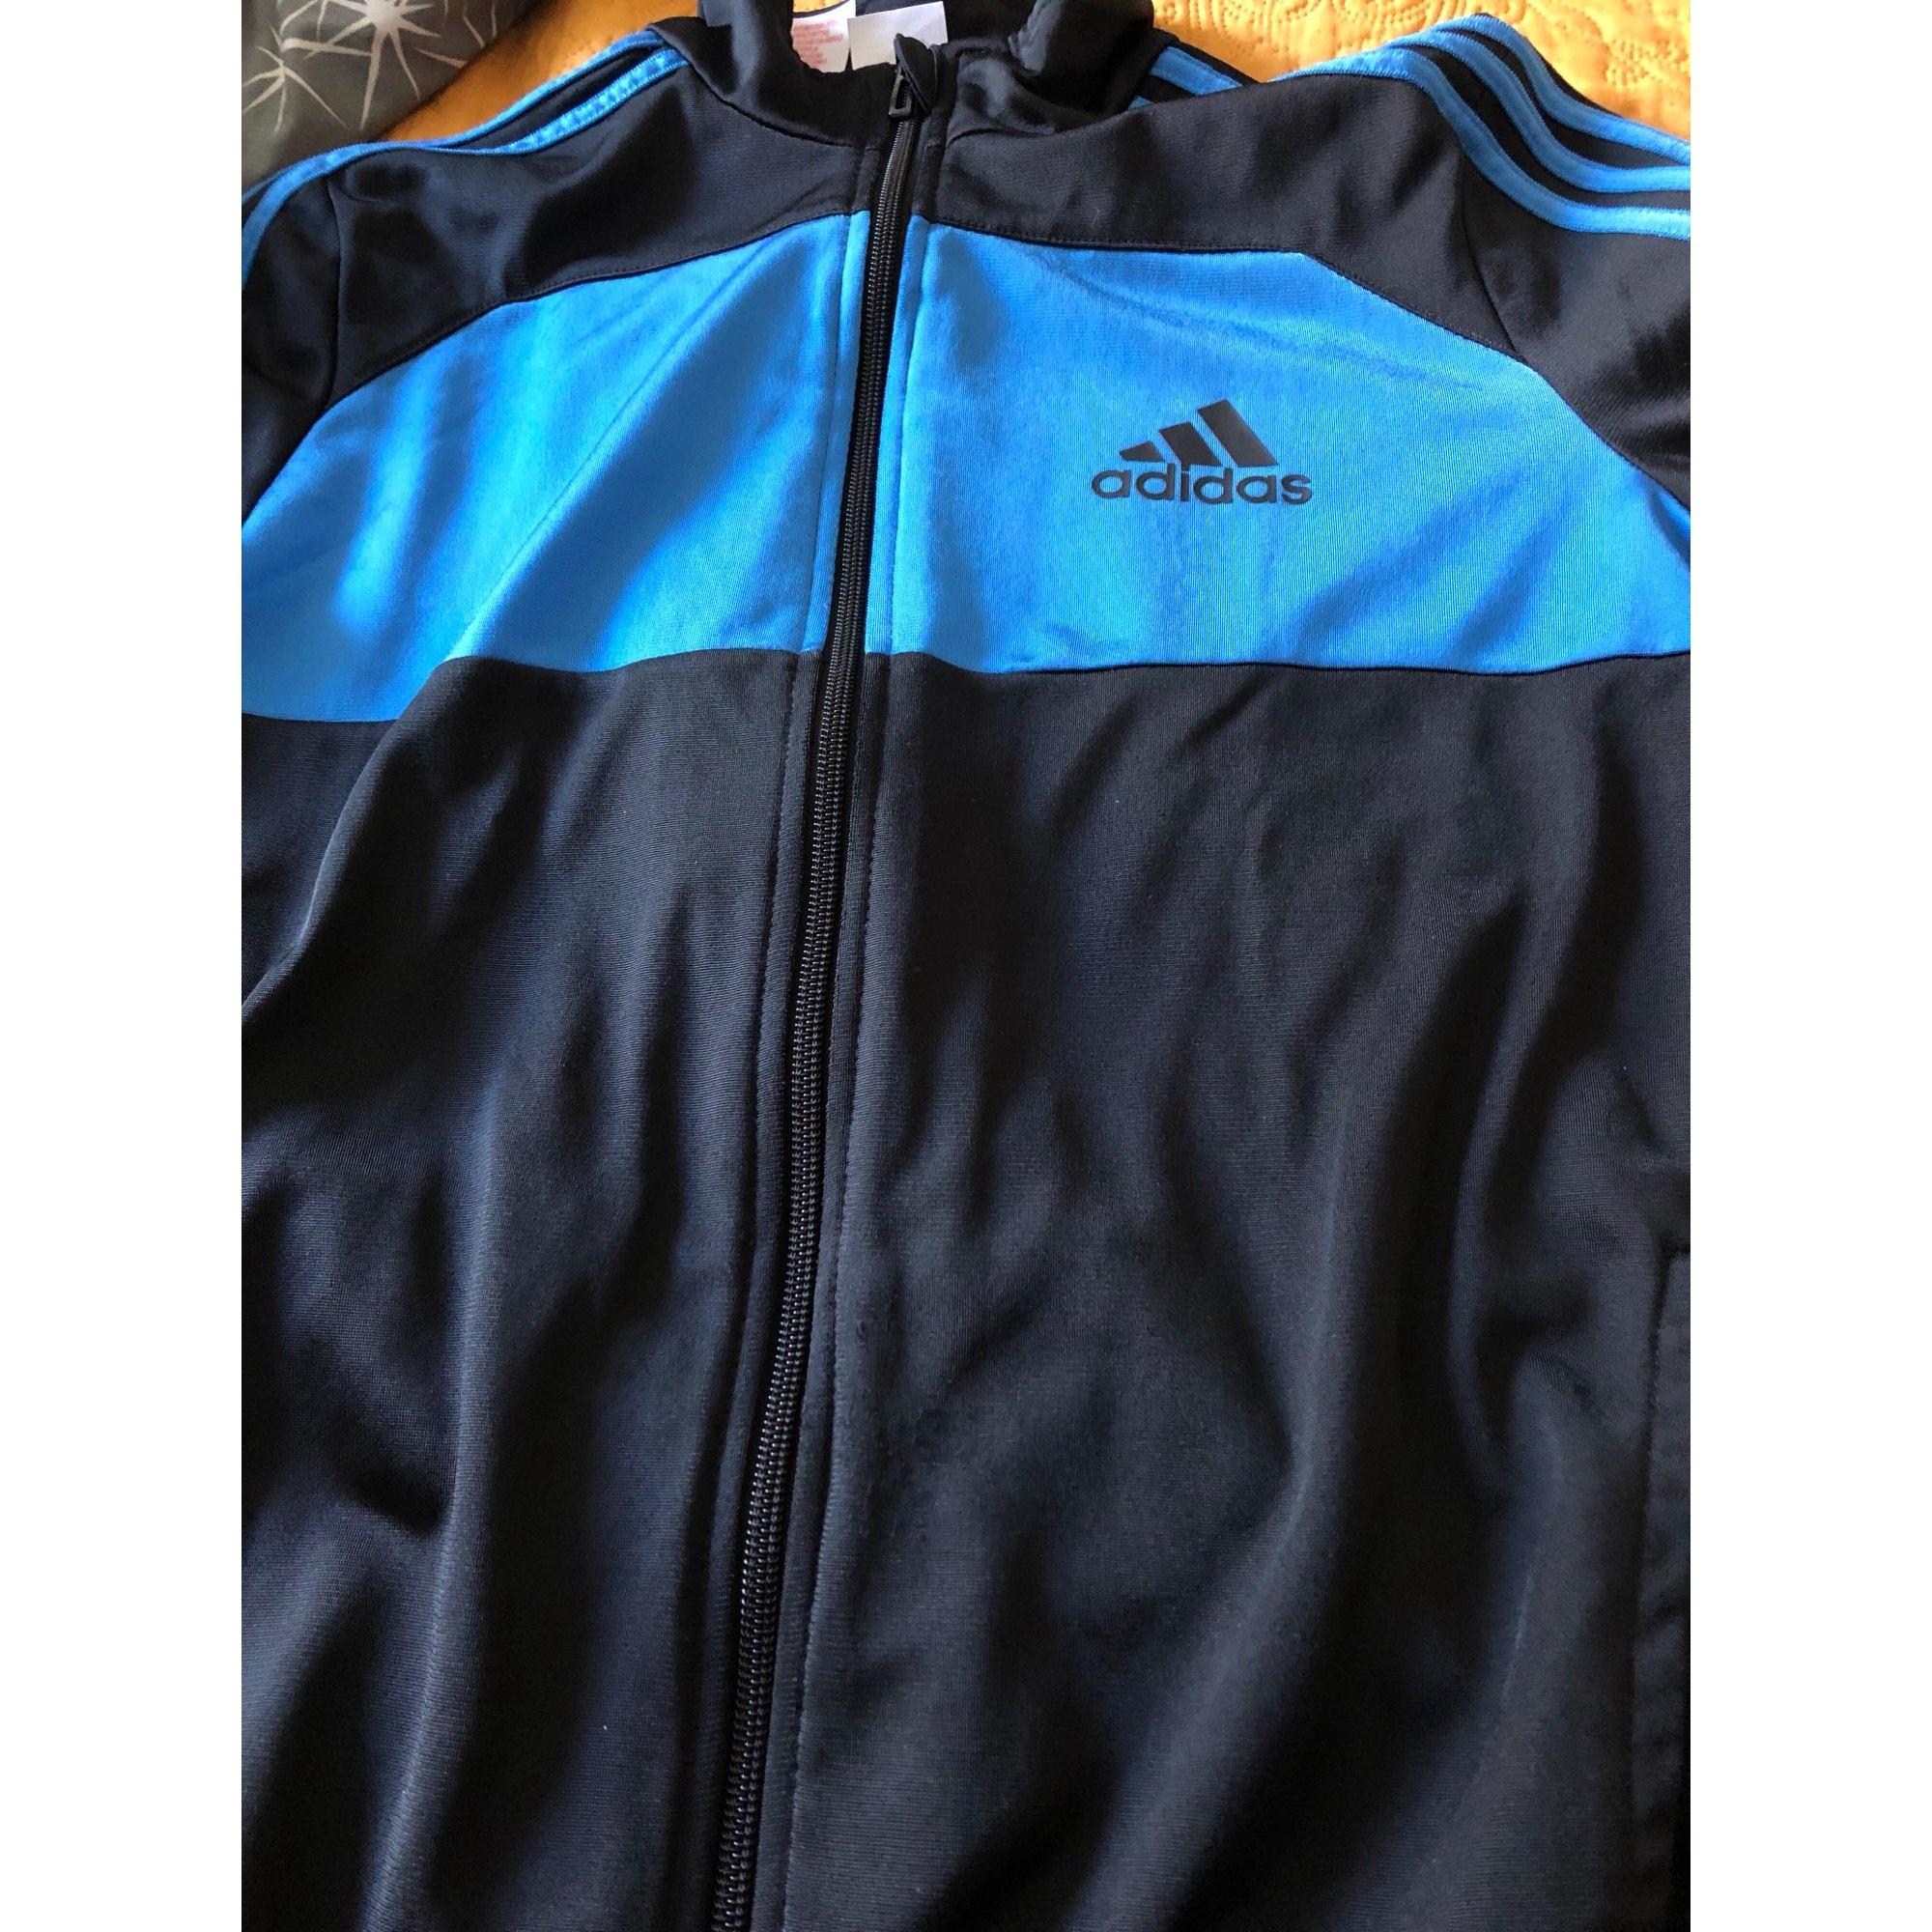 Ensemble jogging ADIDAS Bleu, bleu marine, bleu turquoise